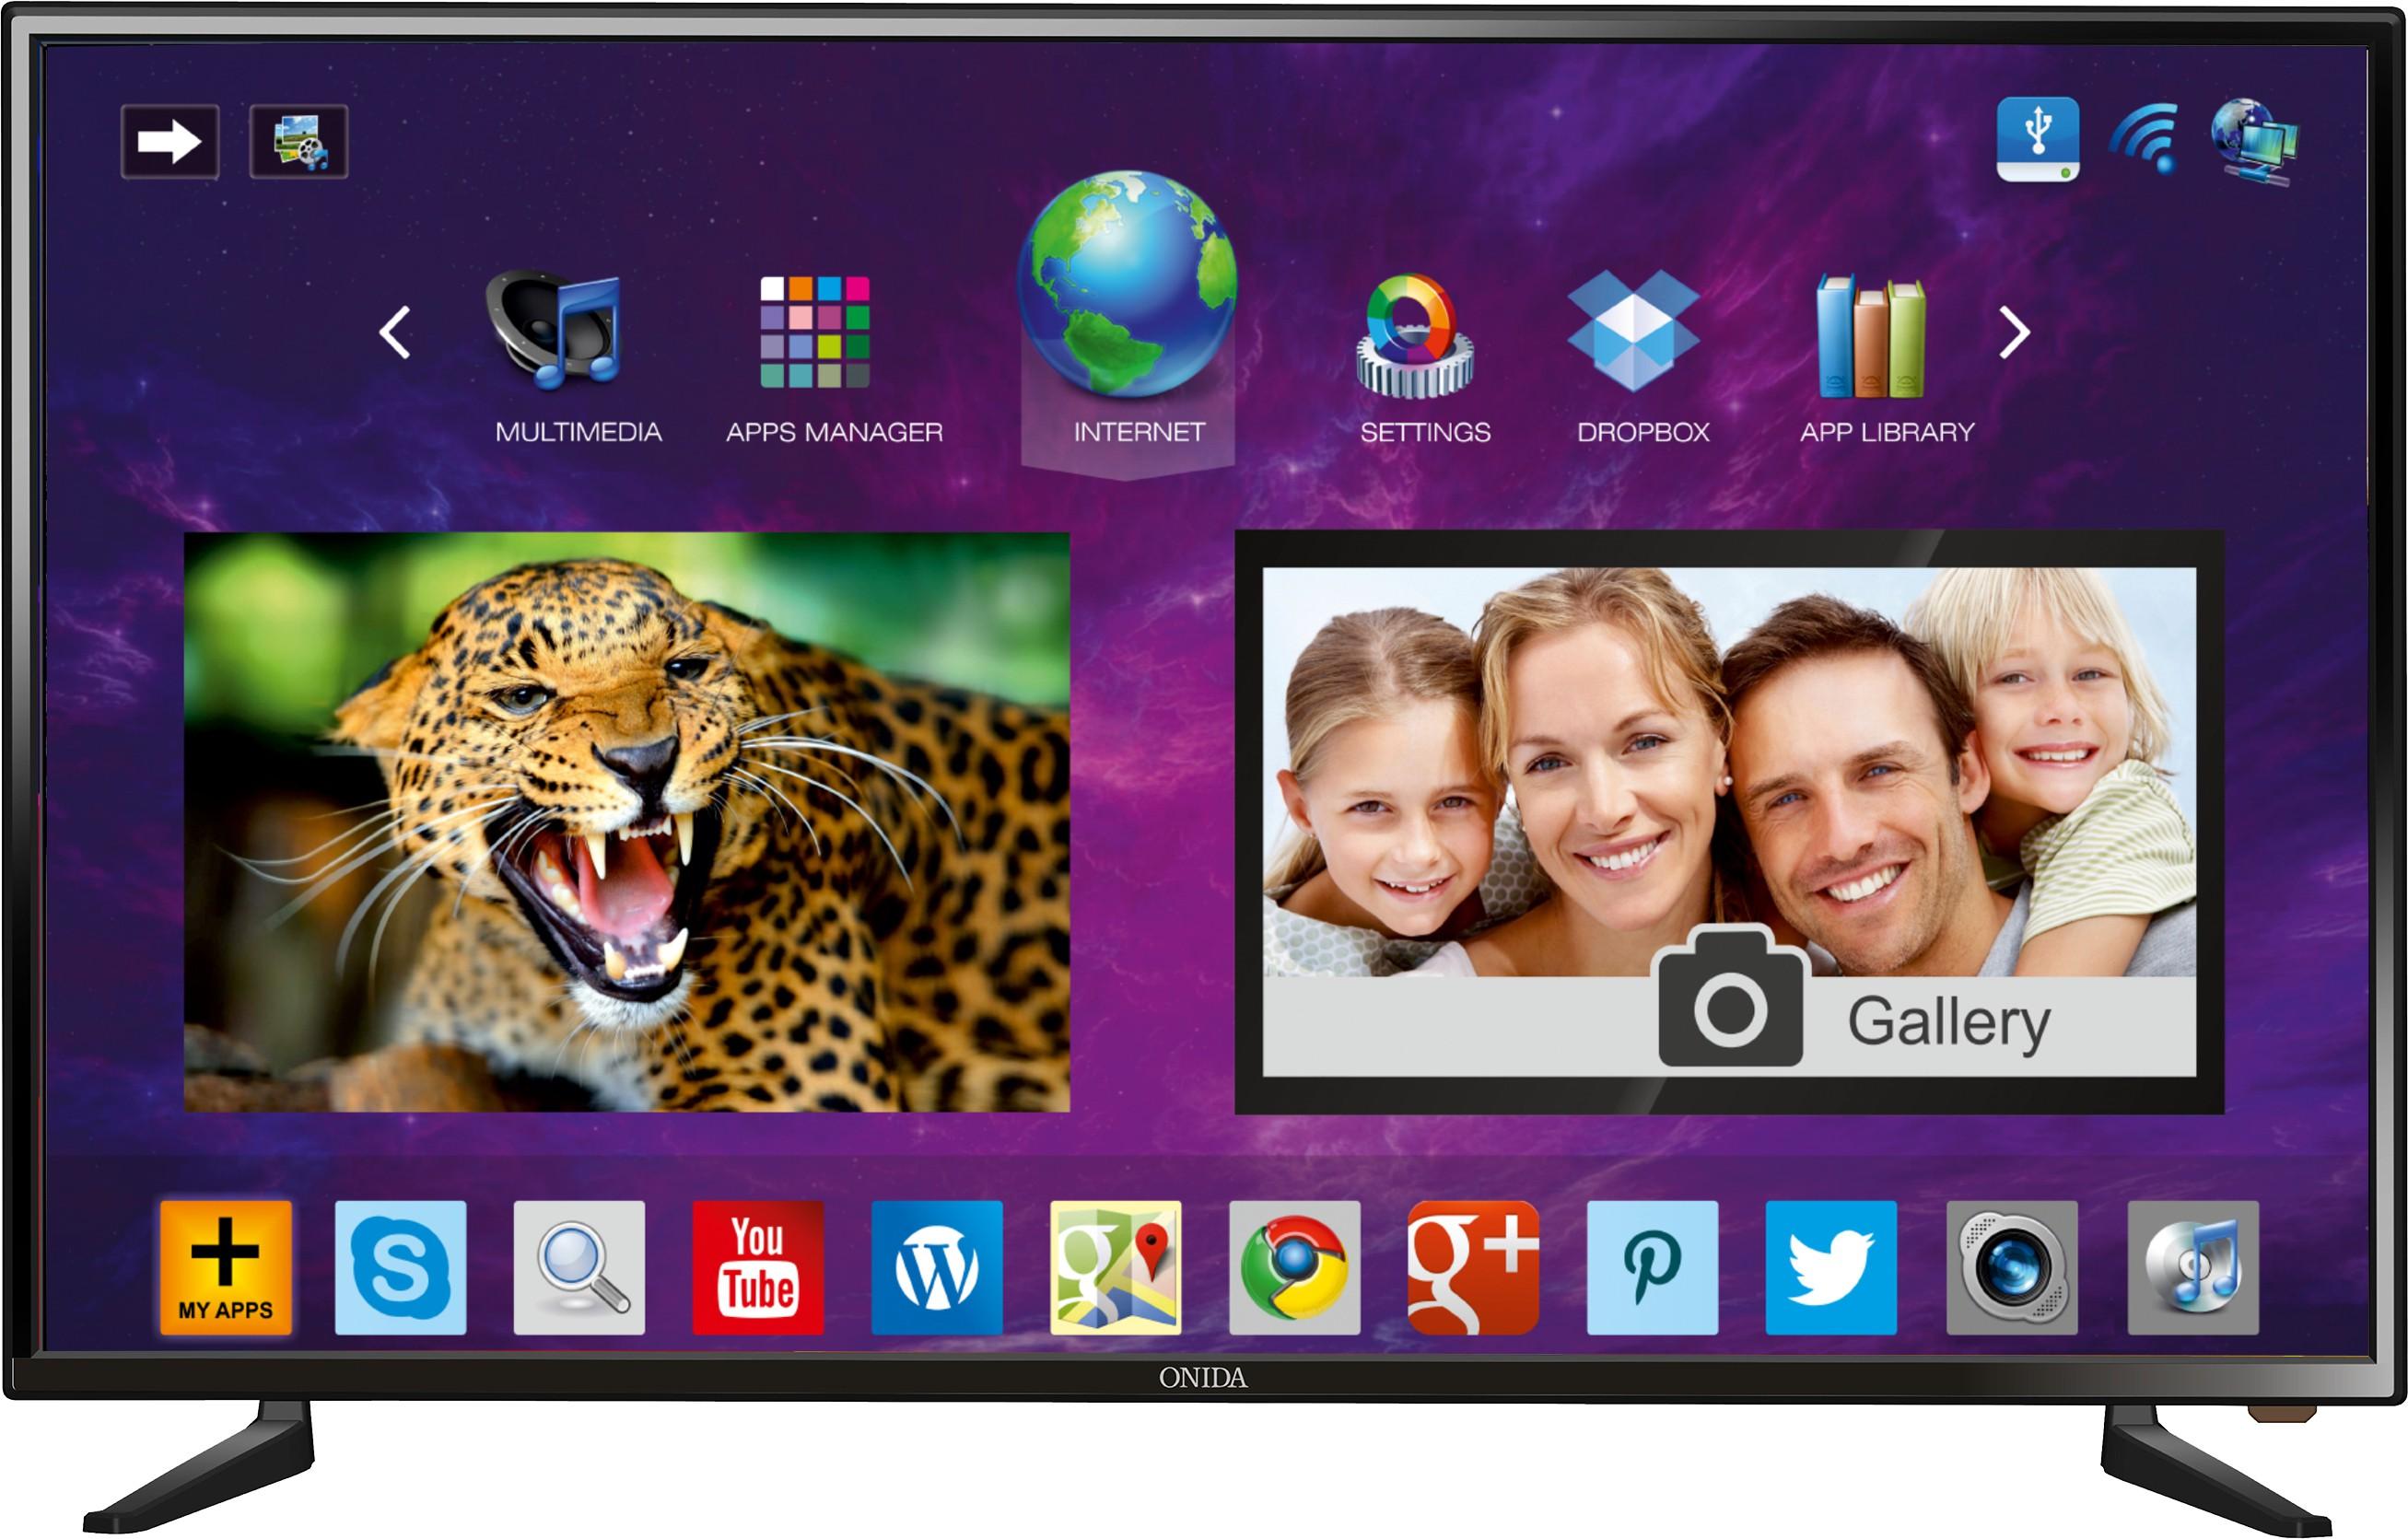 ONIDA 42FIE 42 Inches Full HD LED TV